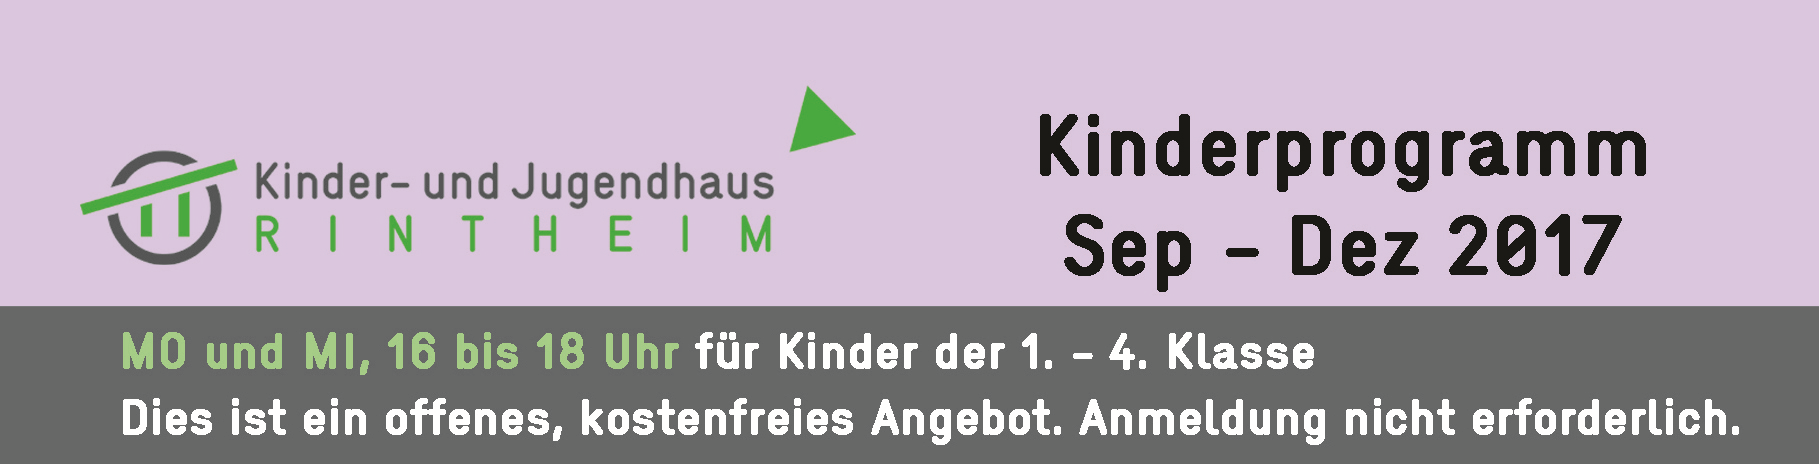 Kinderprogramm Rintheim_Sep-Dez2017 for itnternet